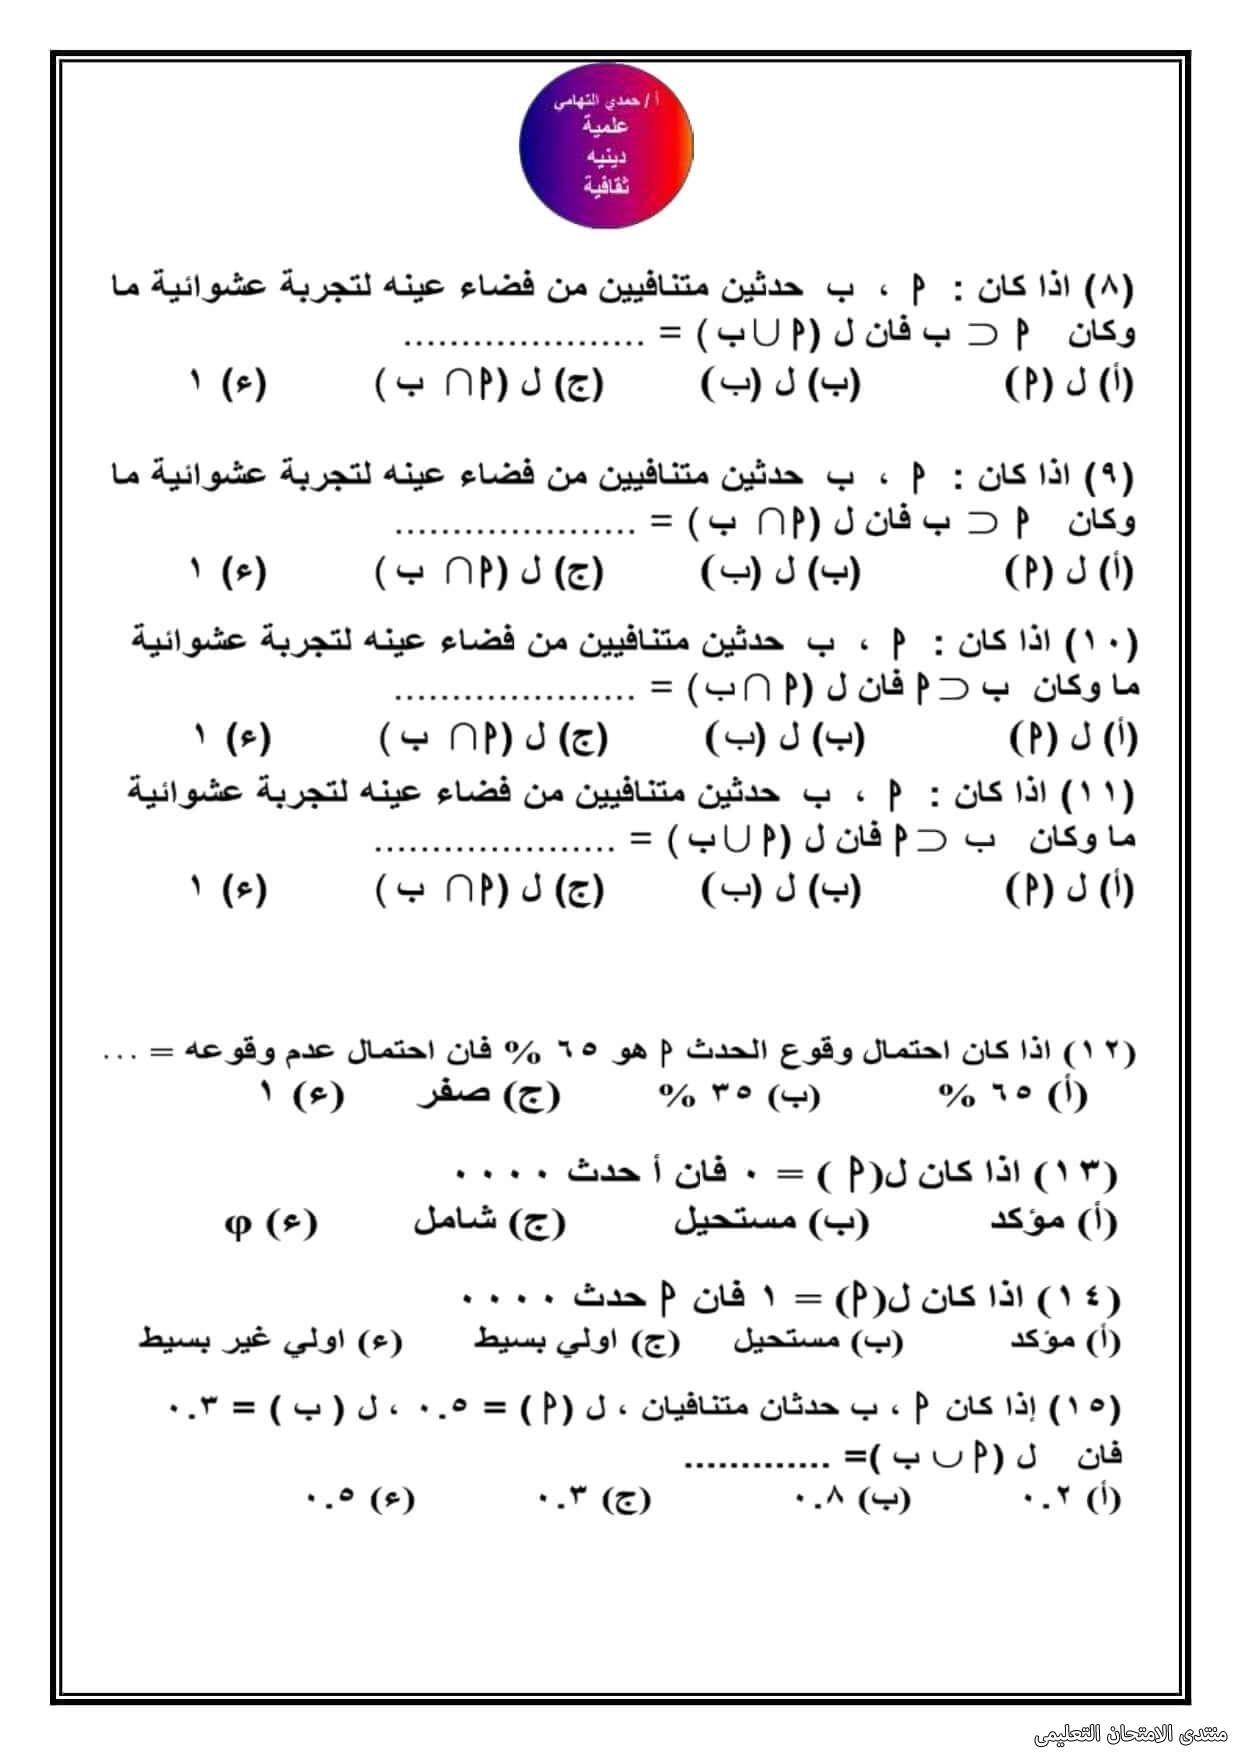 exam-eg.com_162100931749986.jpg